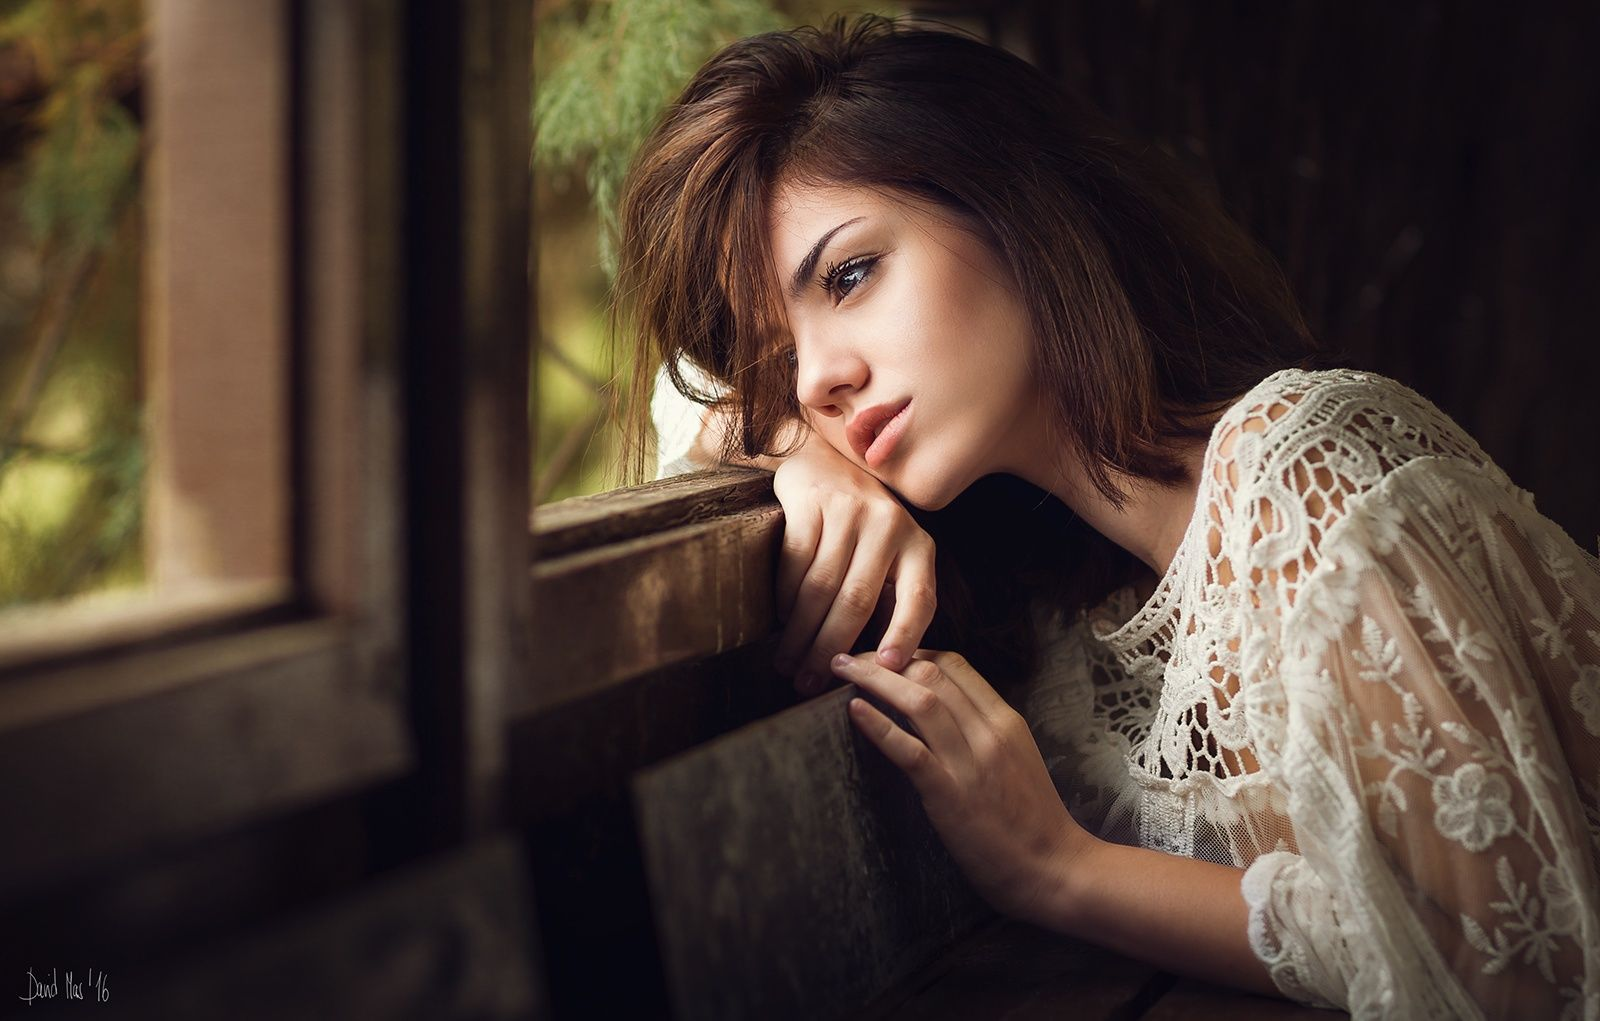 People 1600x1021 David Mas Delaia Gonzalez  women brunette shoulder length hair looking away blouse white clothing window